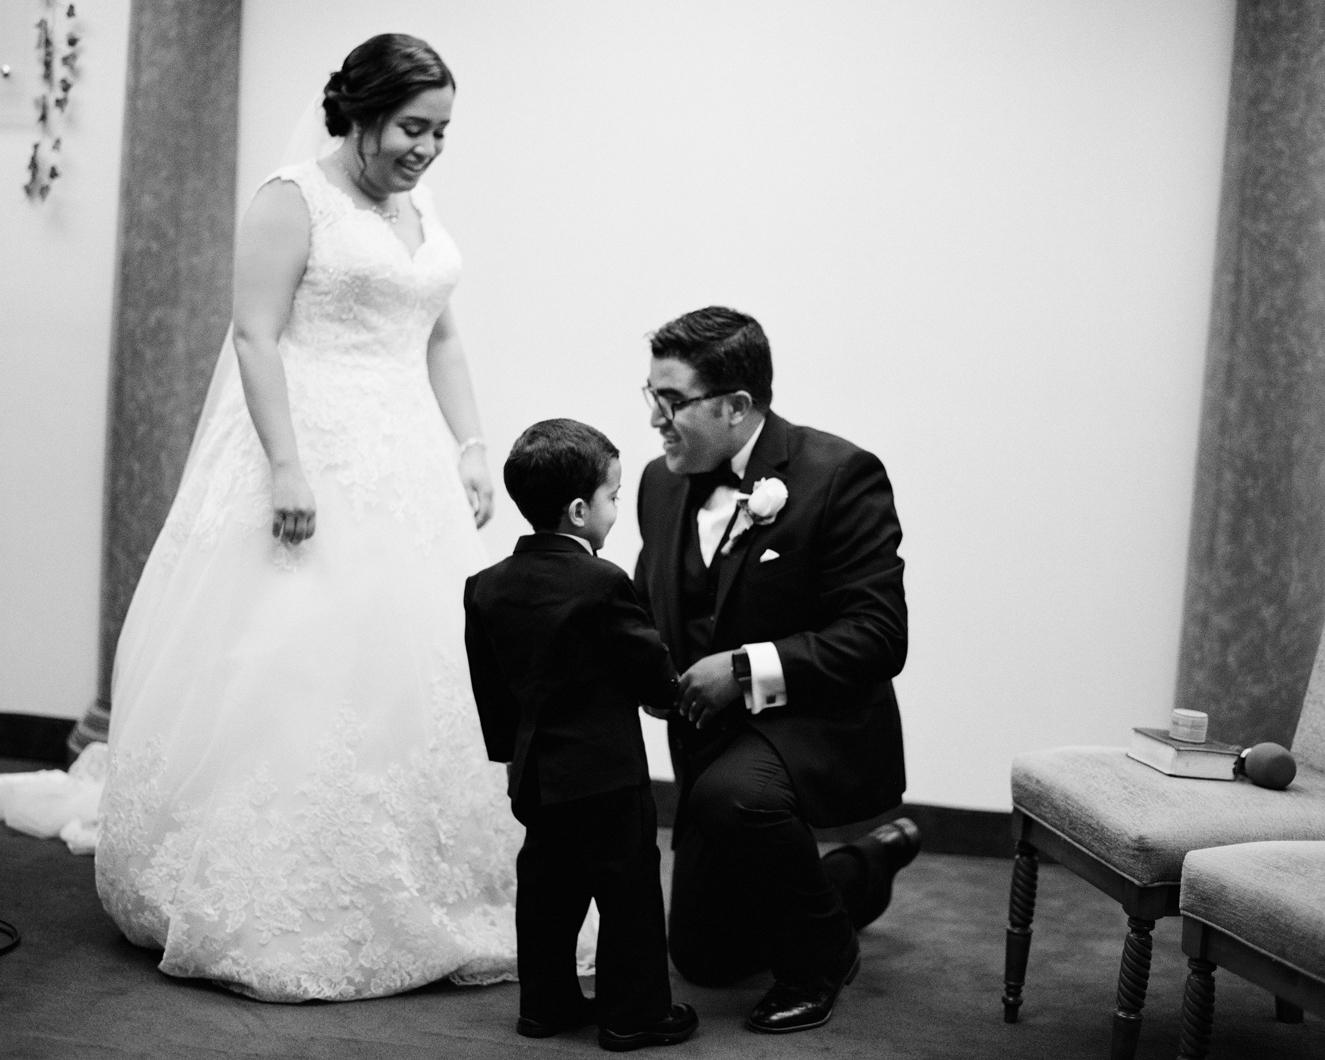 23_wedding-ring-bearer-photography.jpg